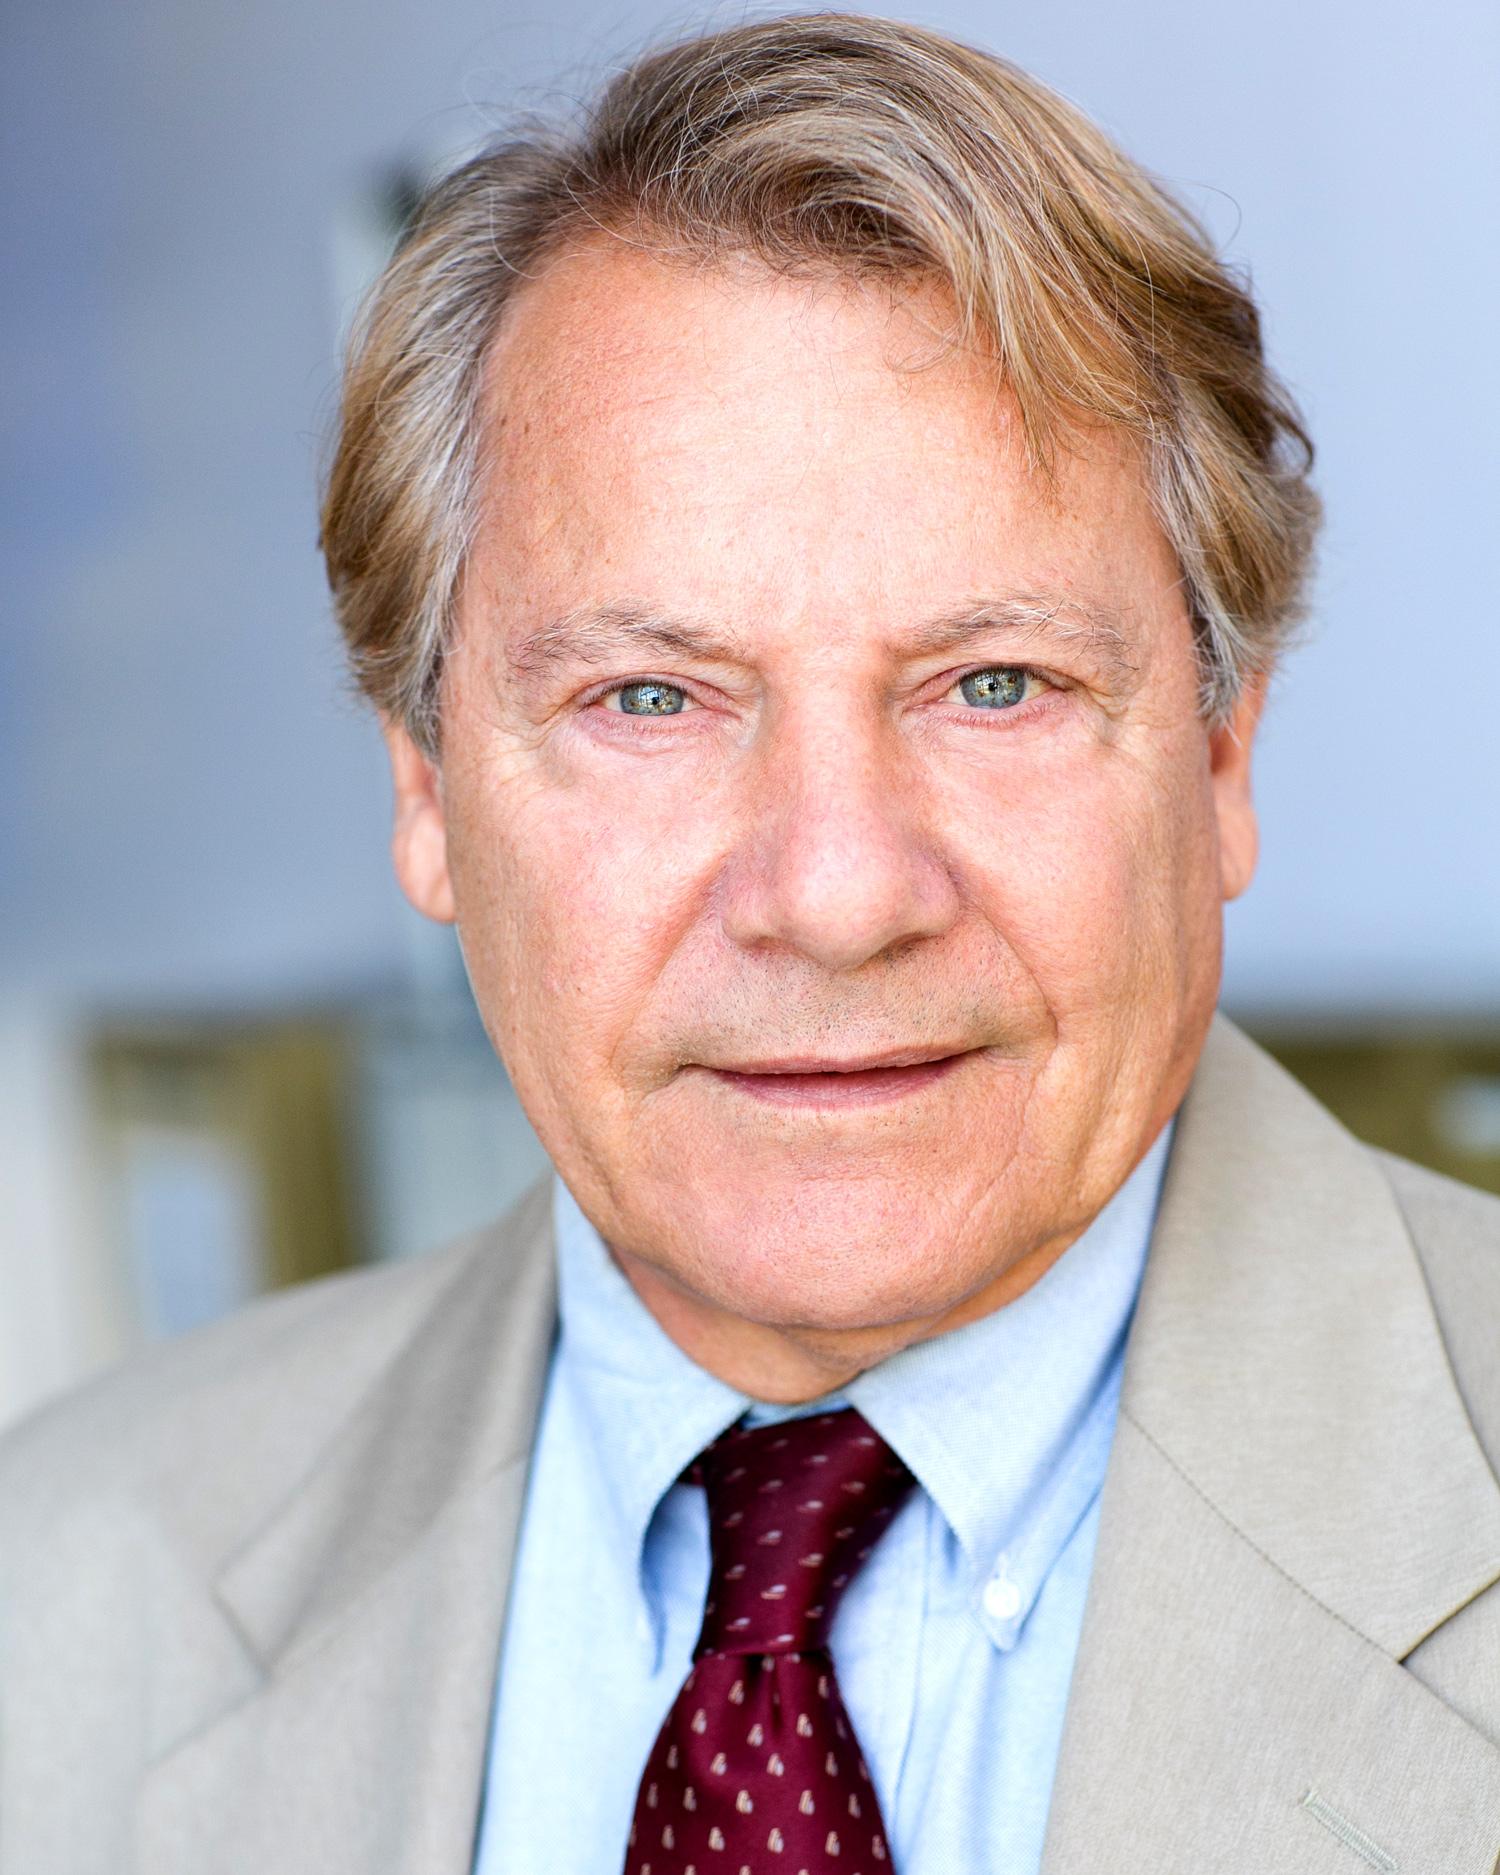 Richard Milanesi